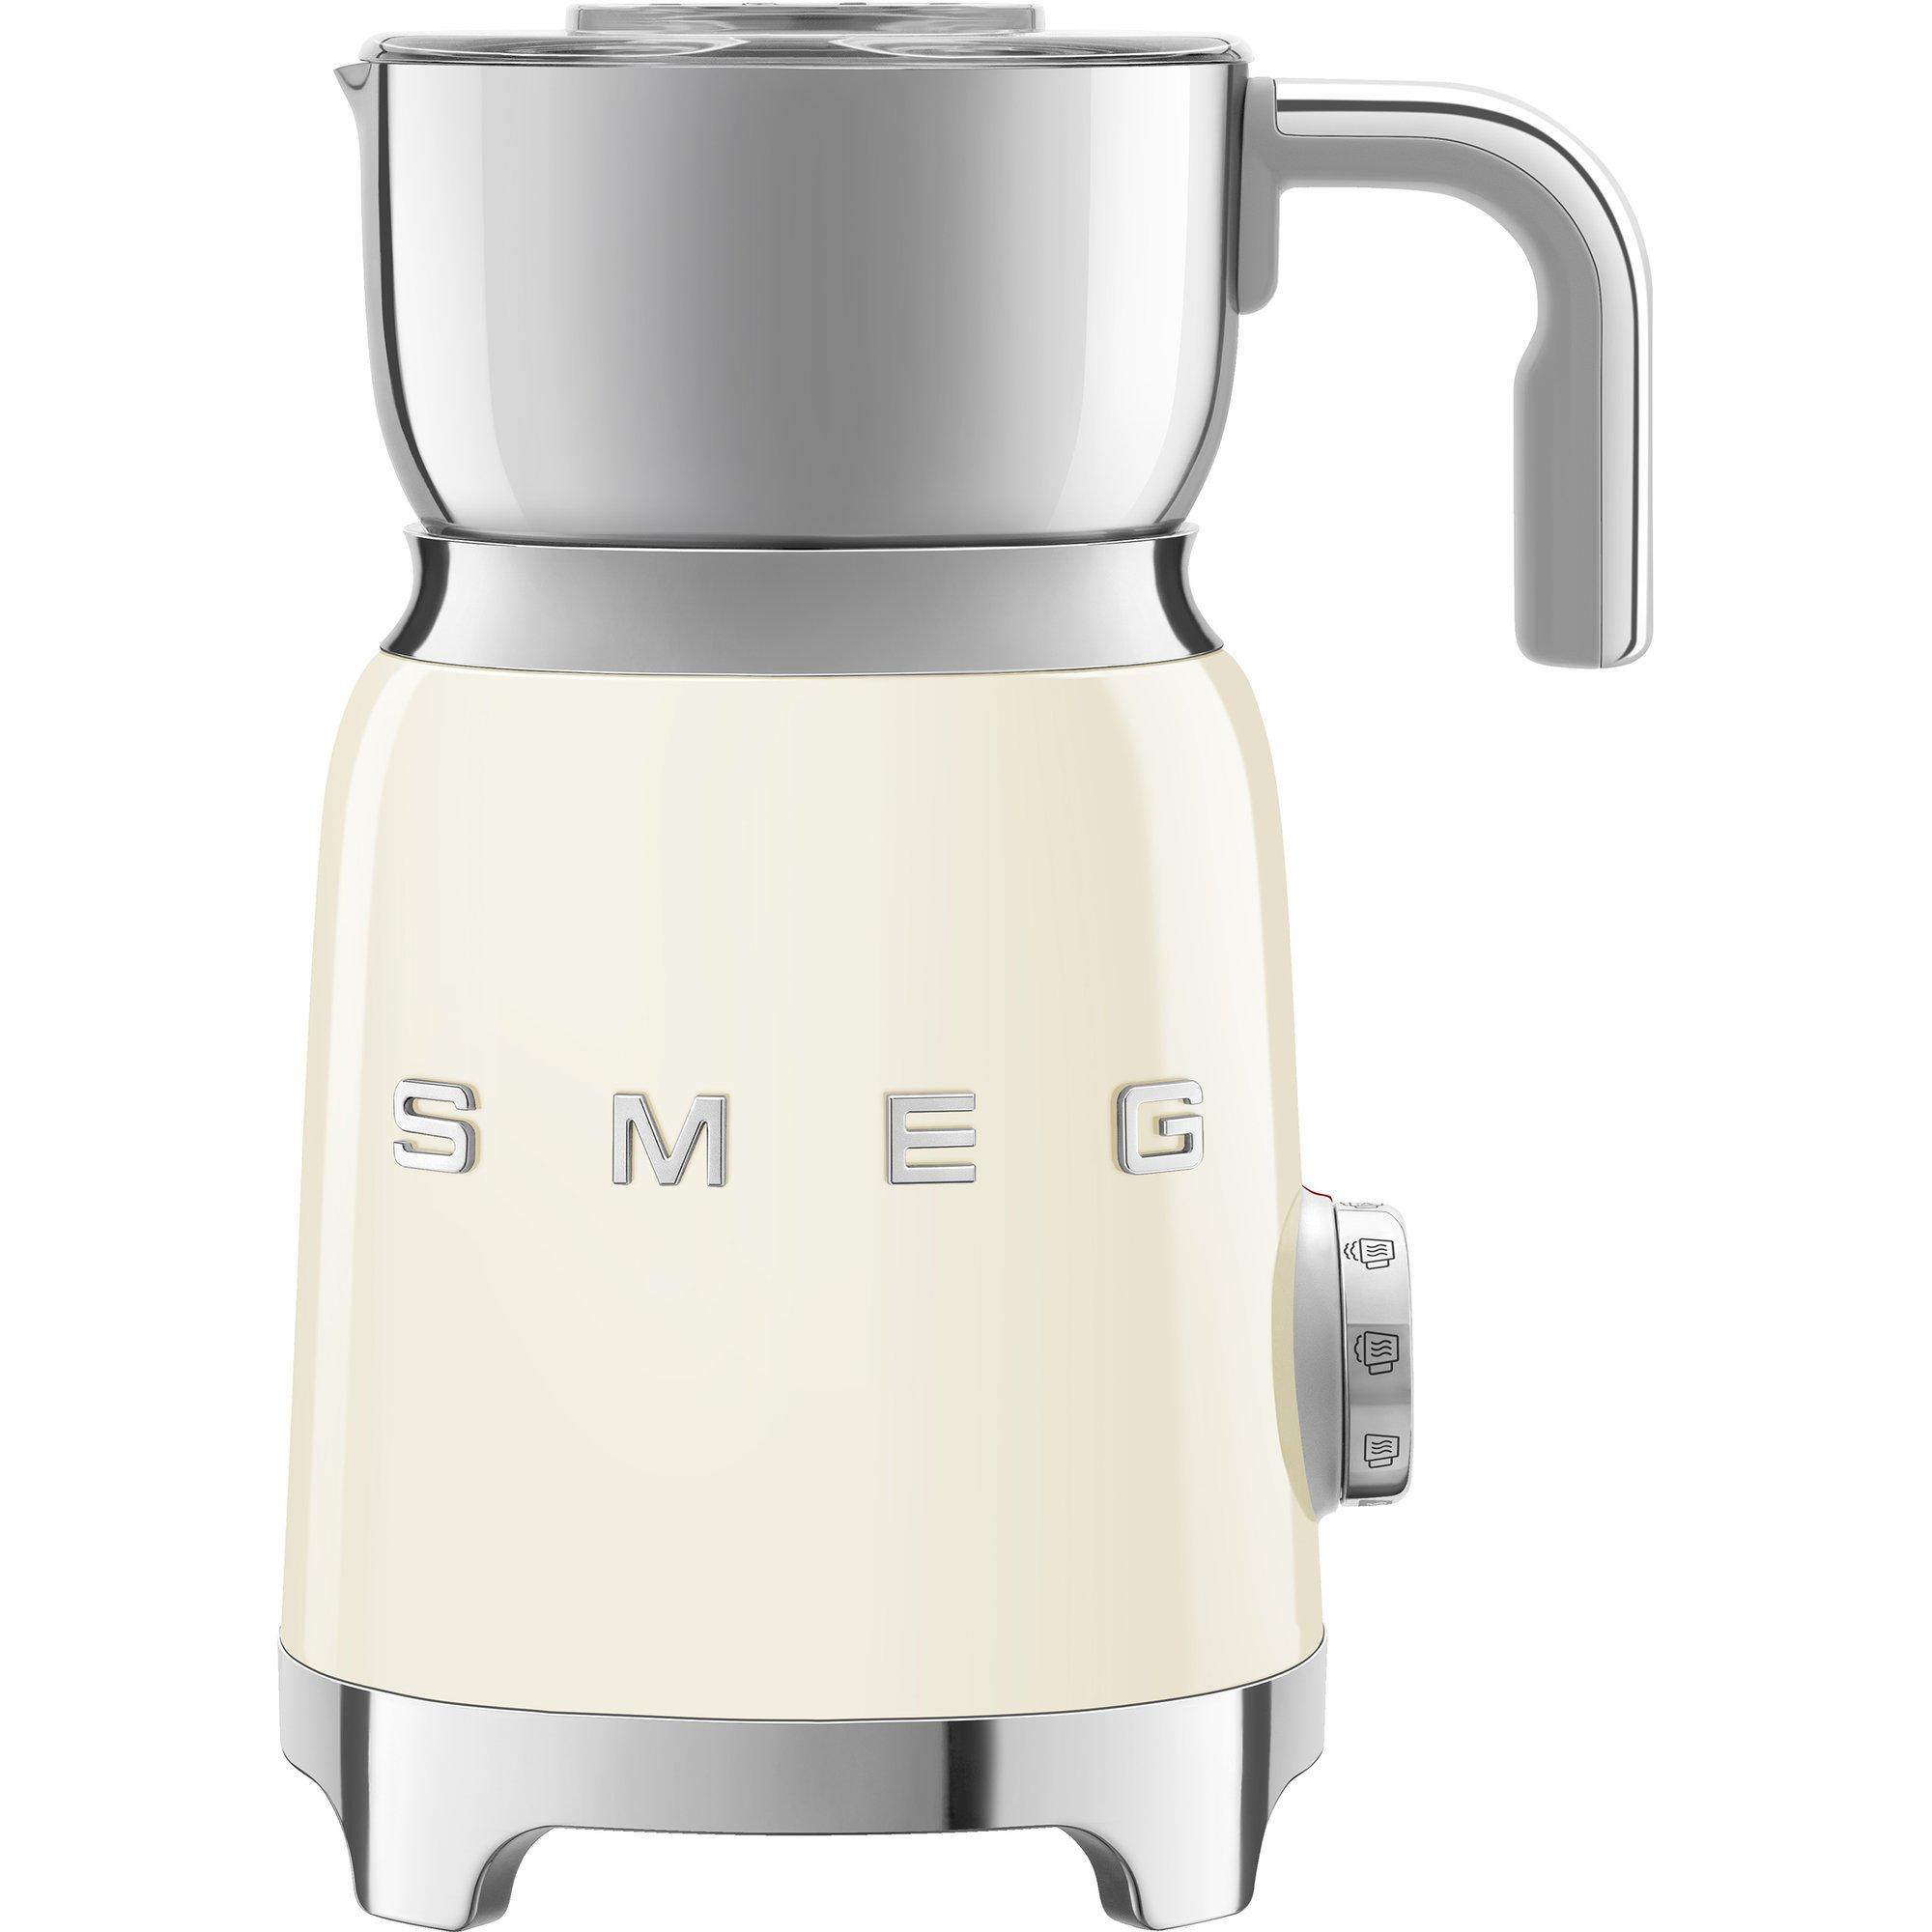 Smeg MFF01 Mjölkskummare Creme